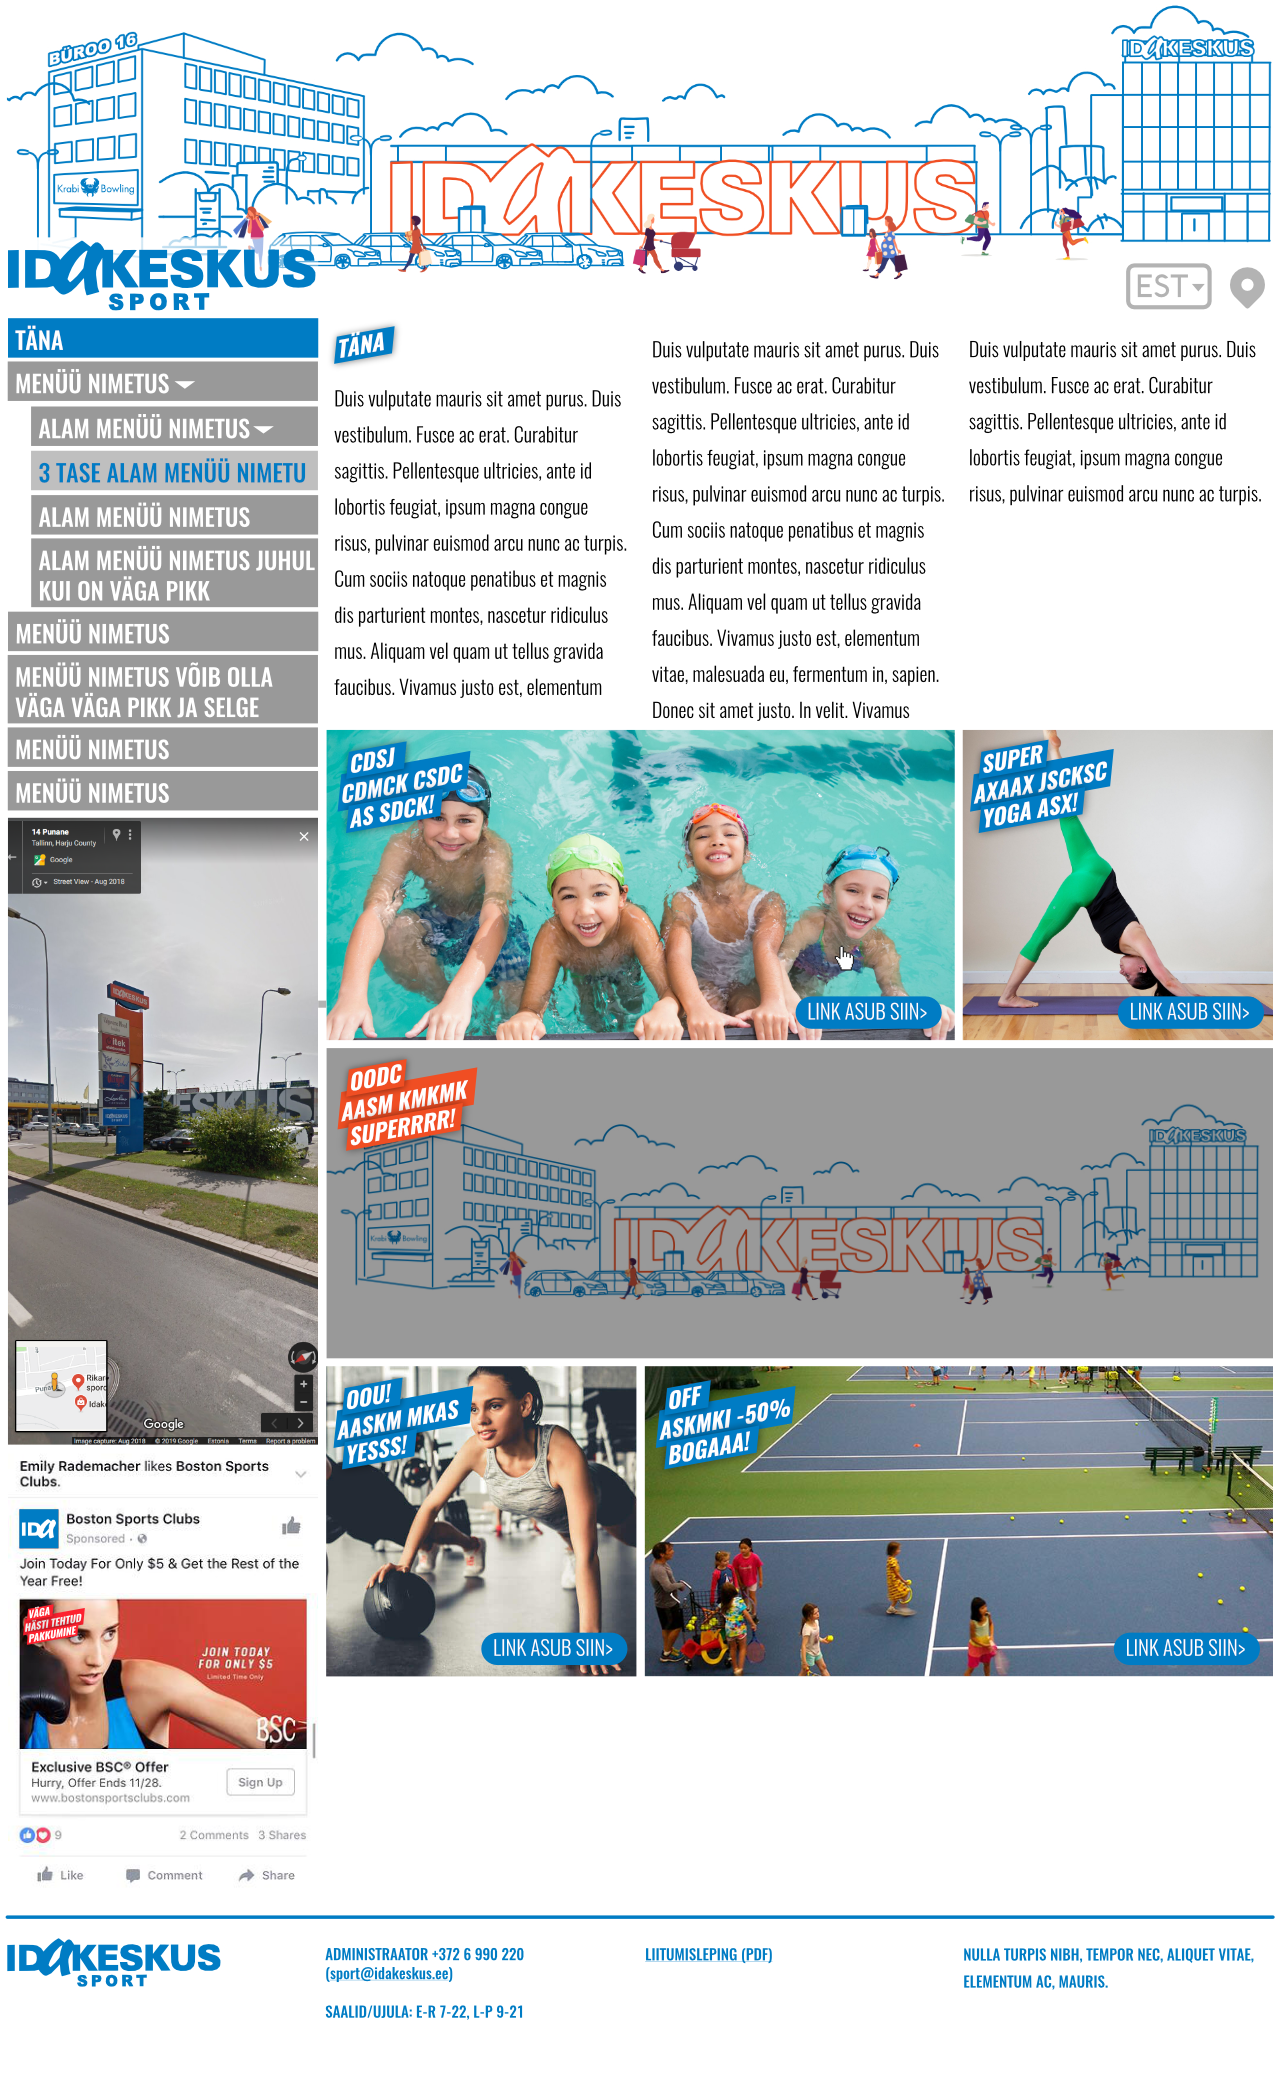 Idakeskus sport desktop